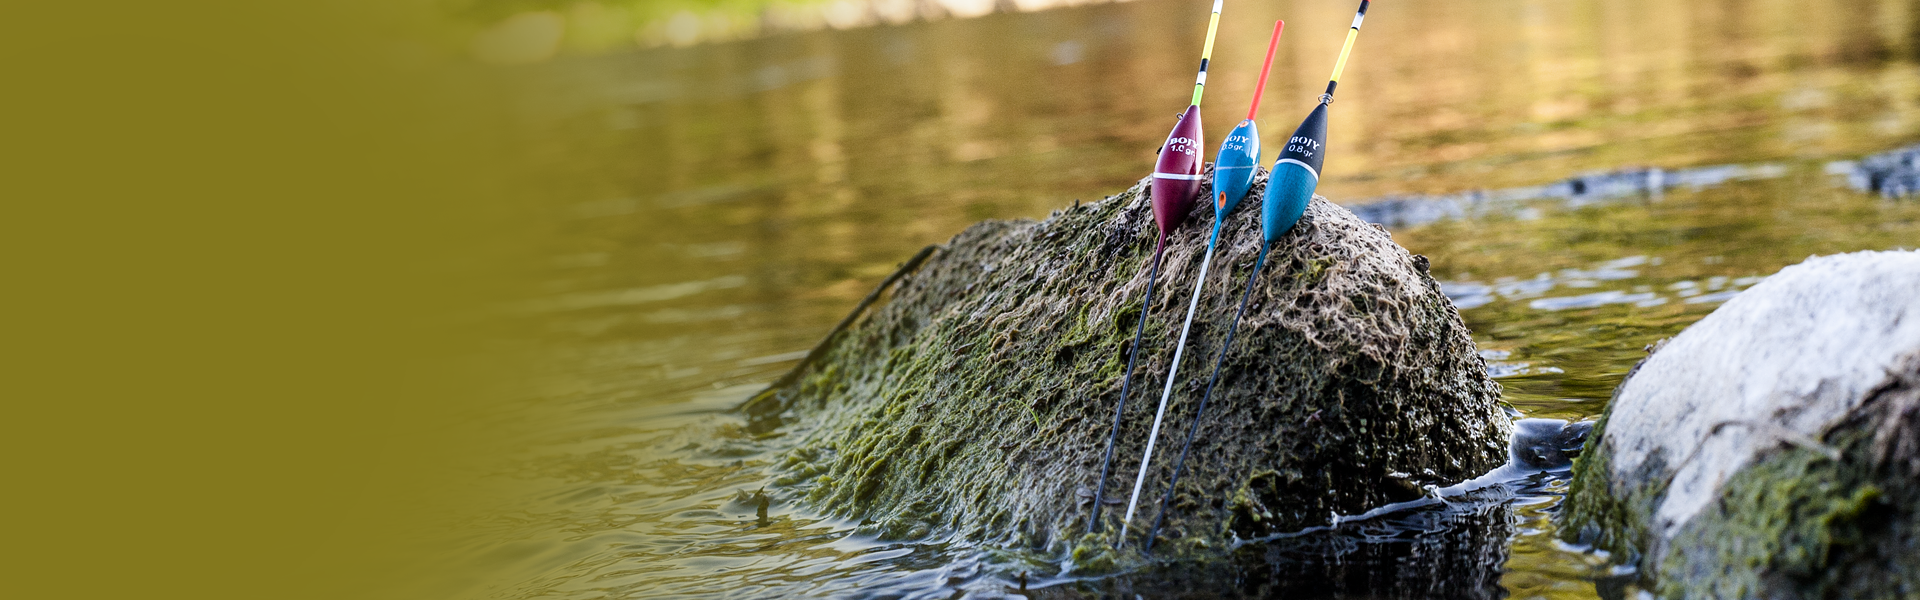 fishing_floats